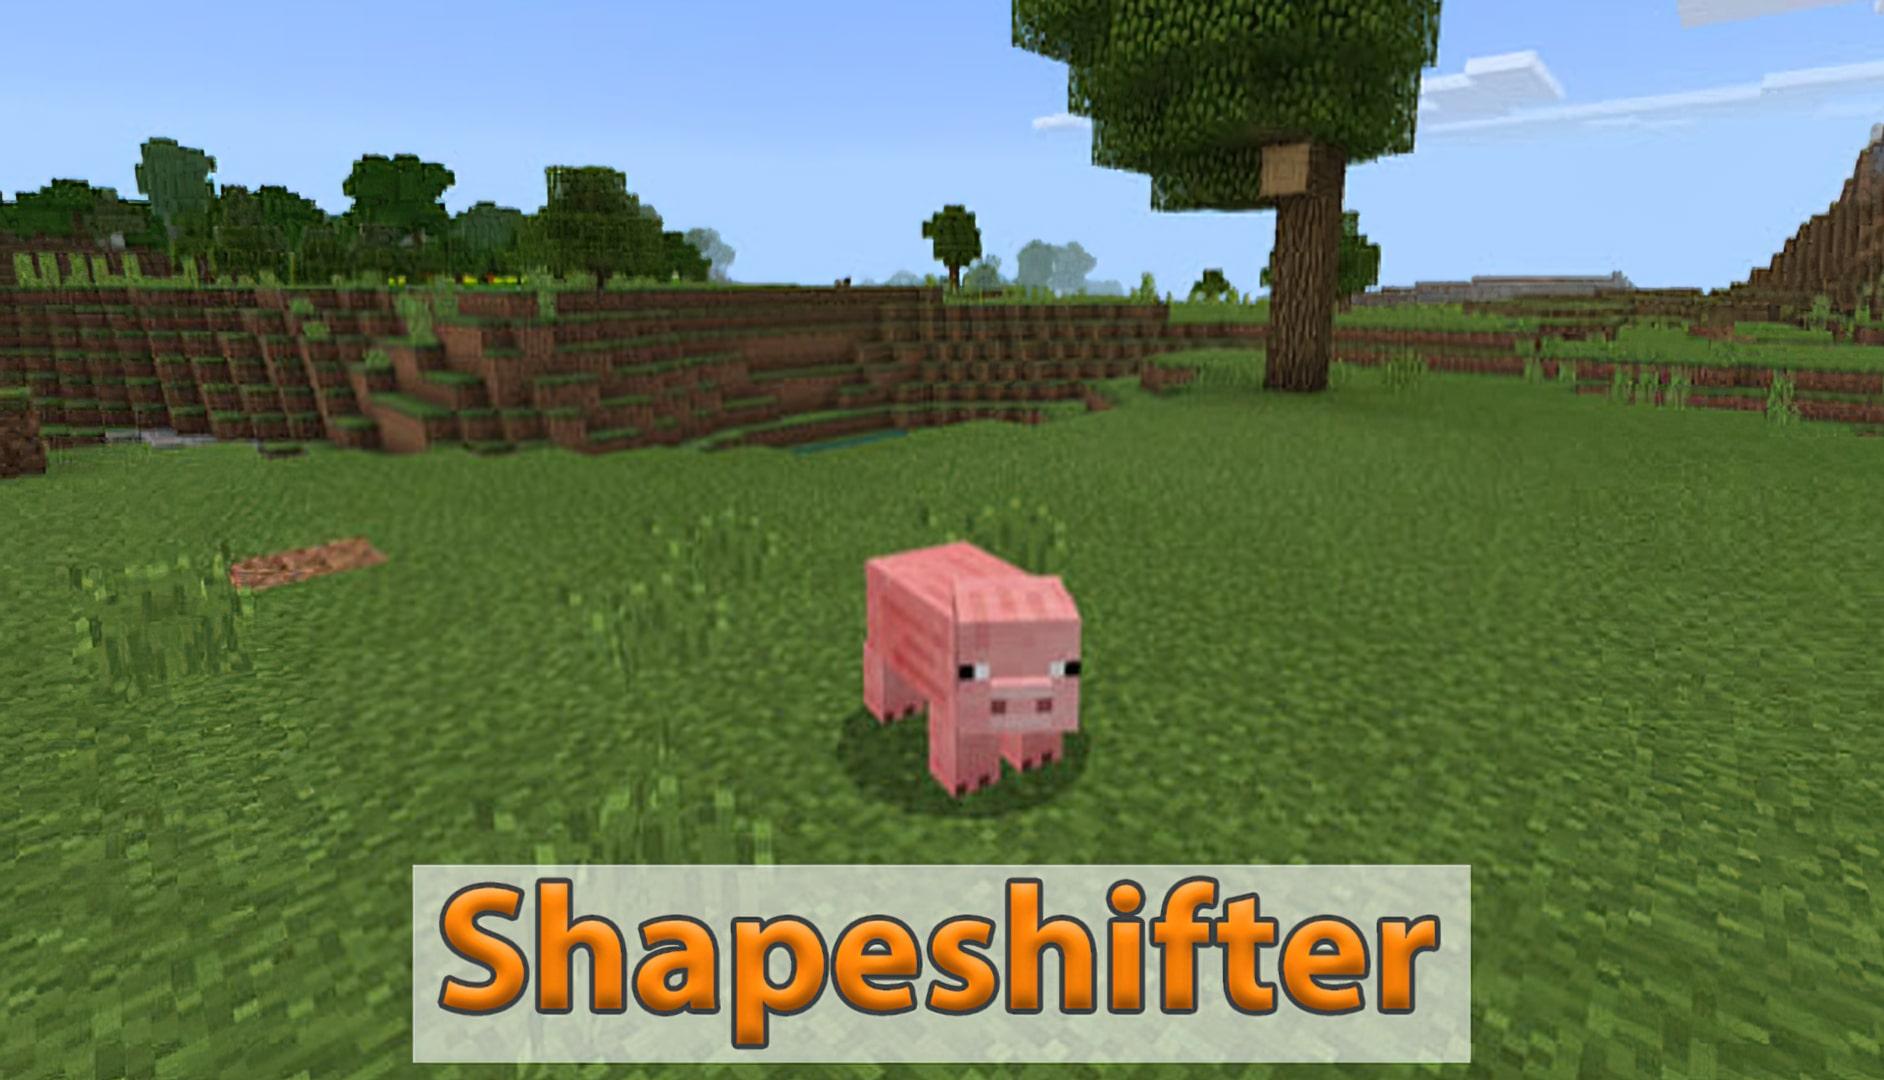 Shapeshifter in Minecraft